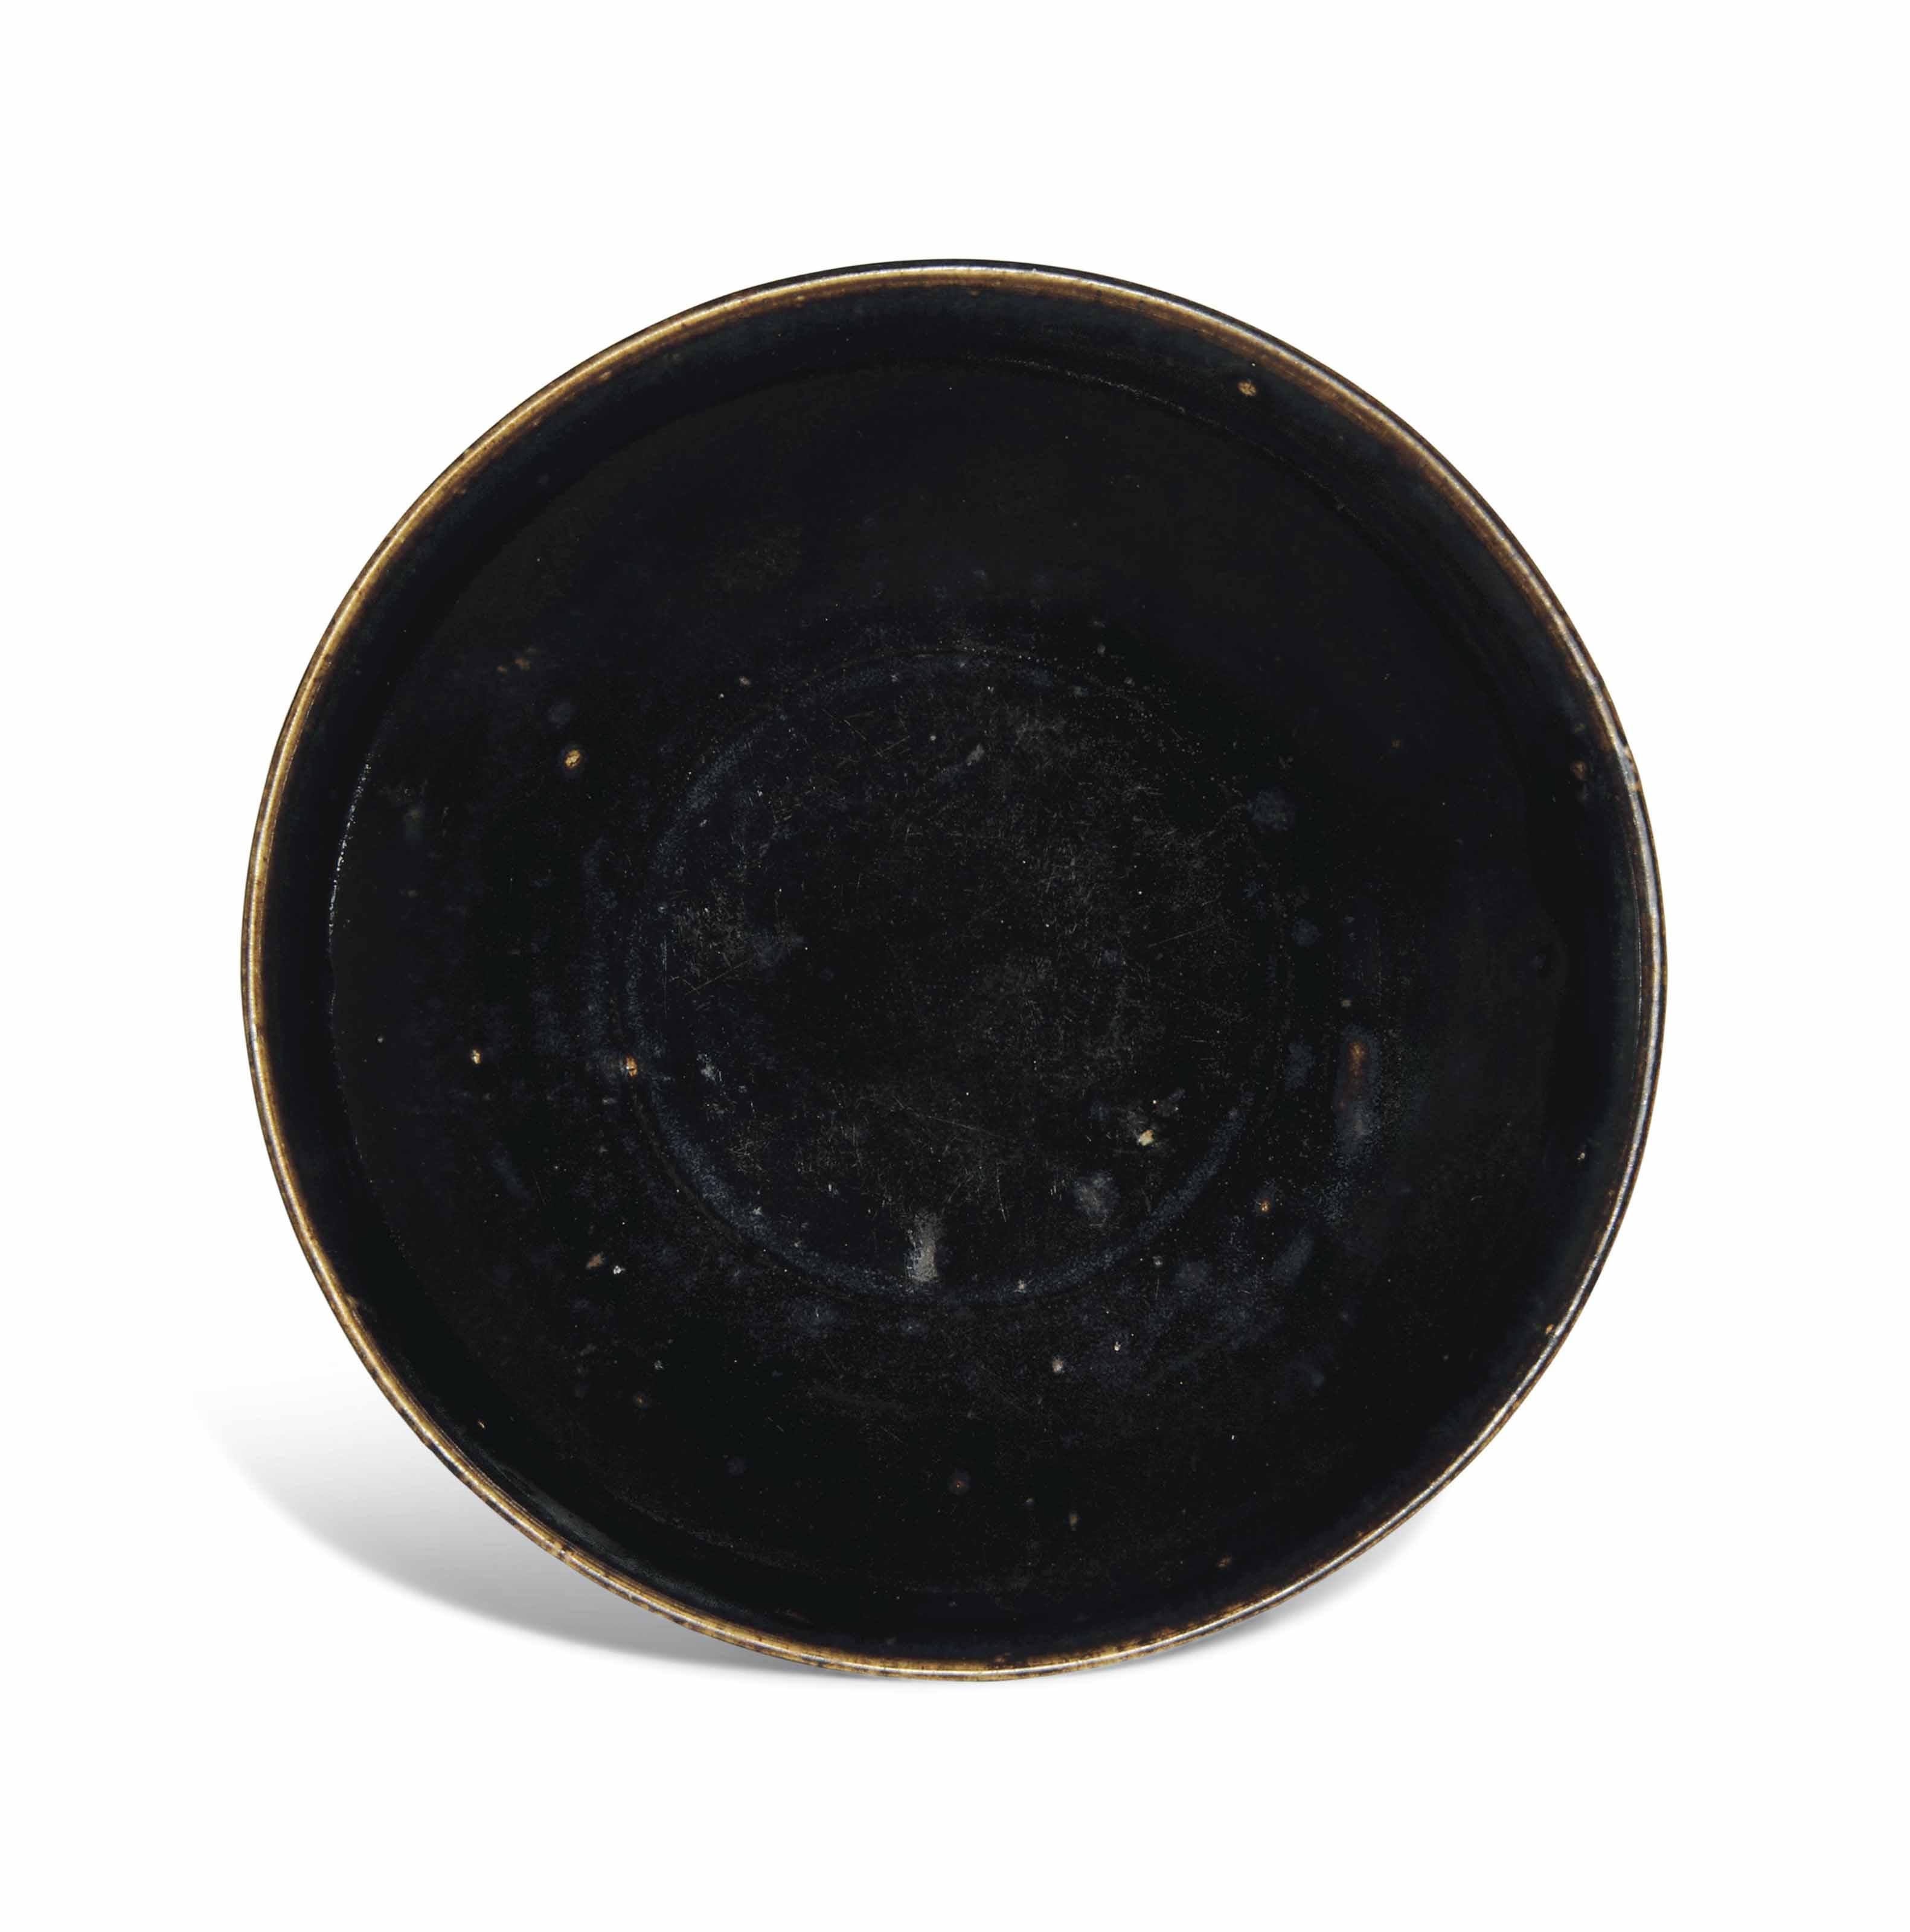 A HENAN BLACK-GLAZED DISH